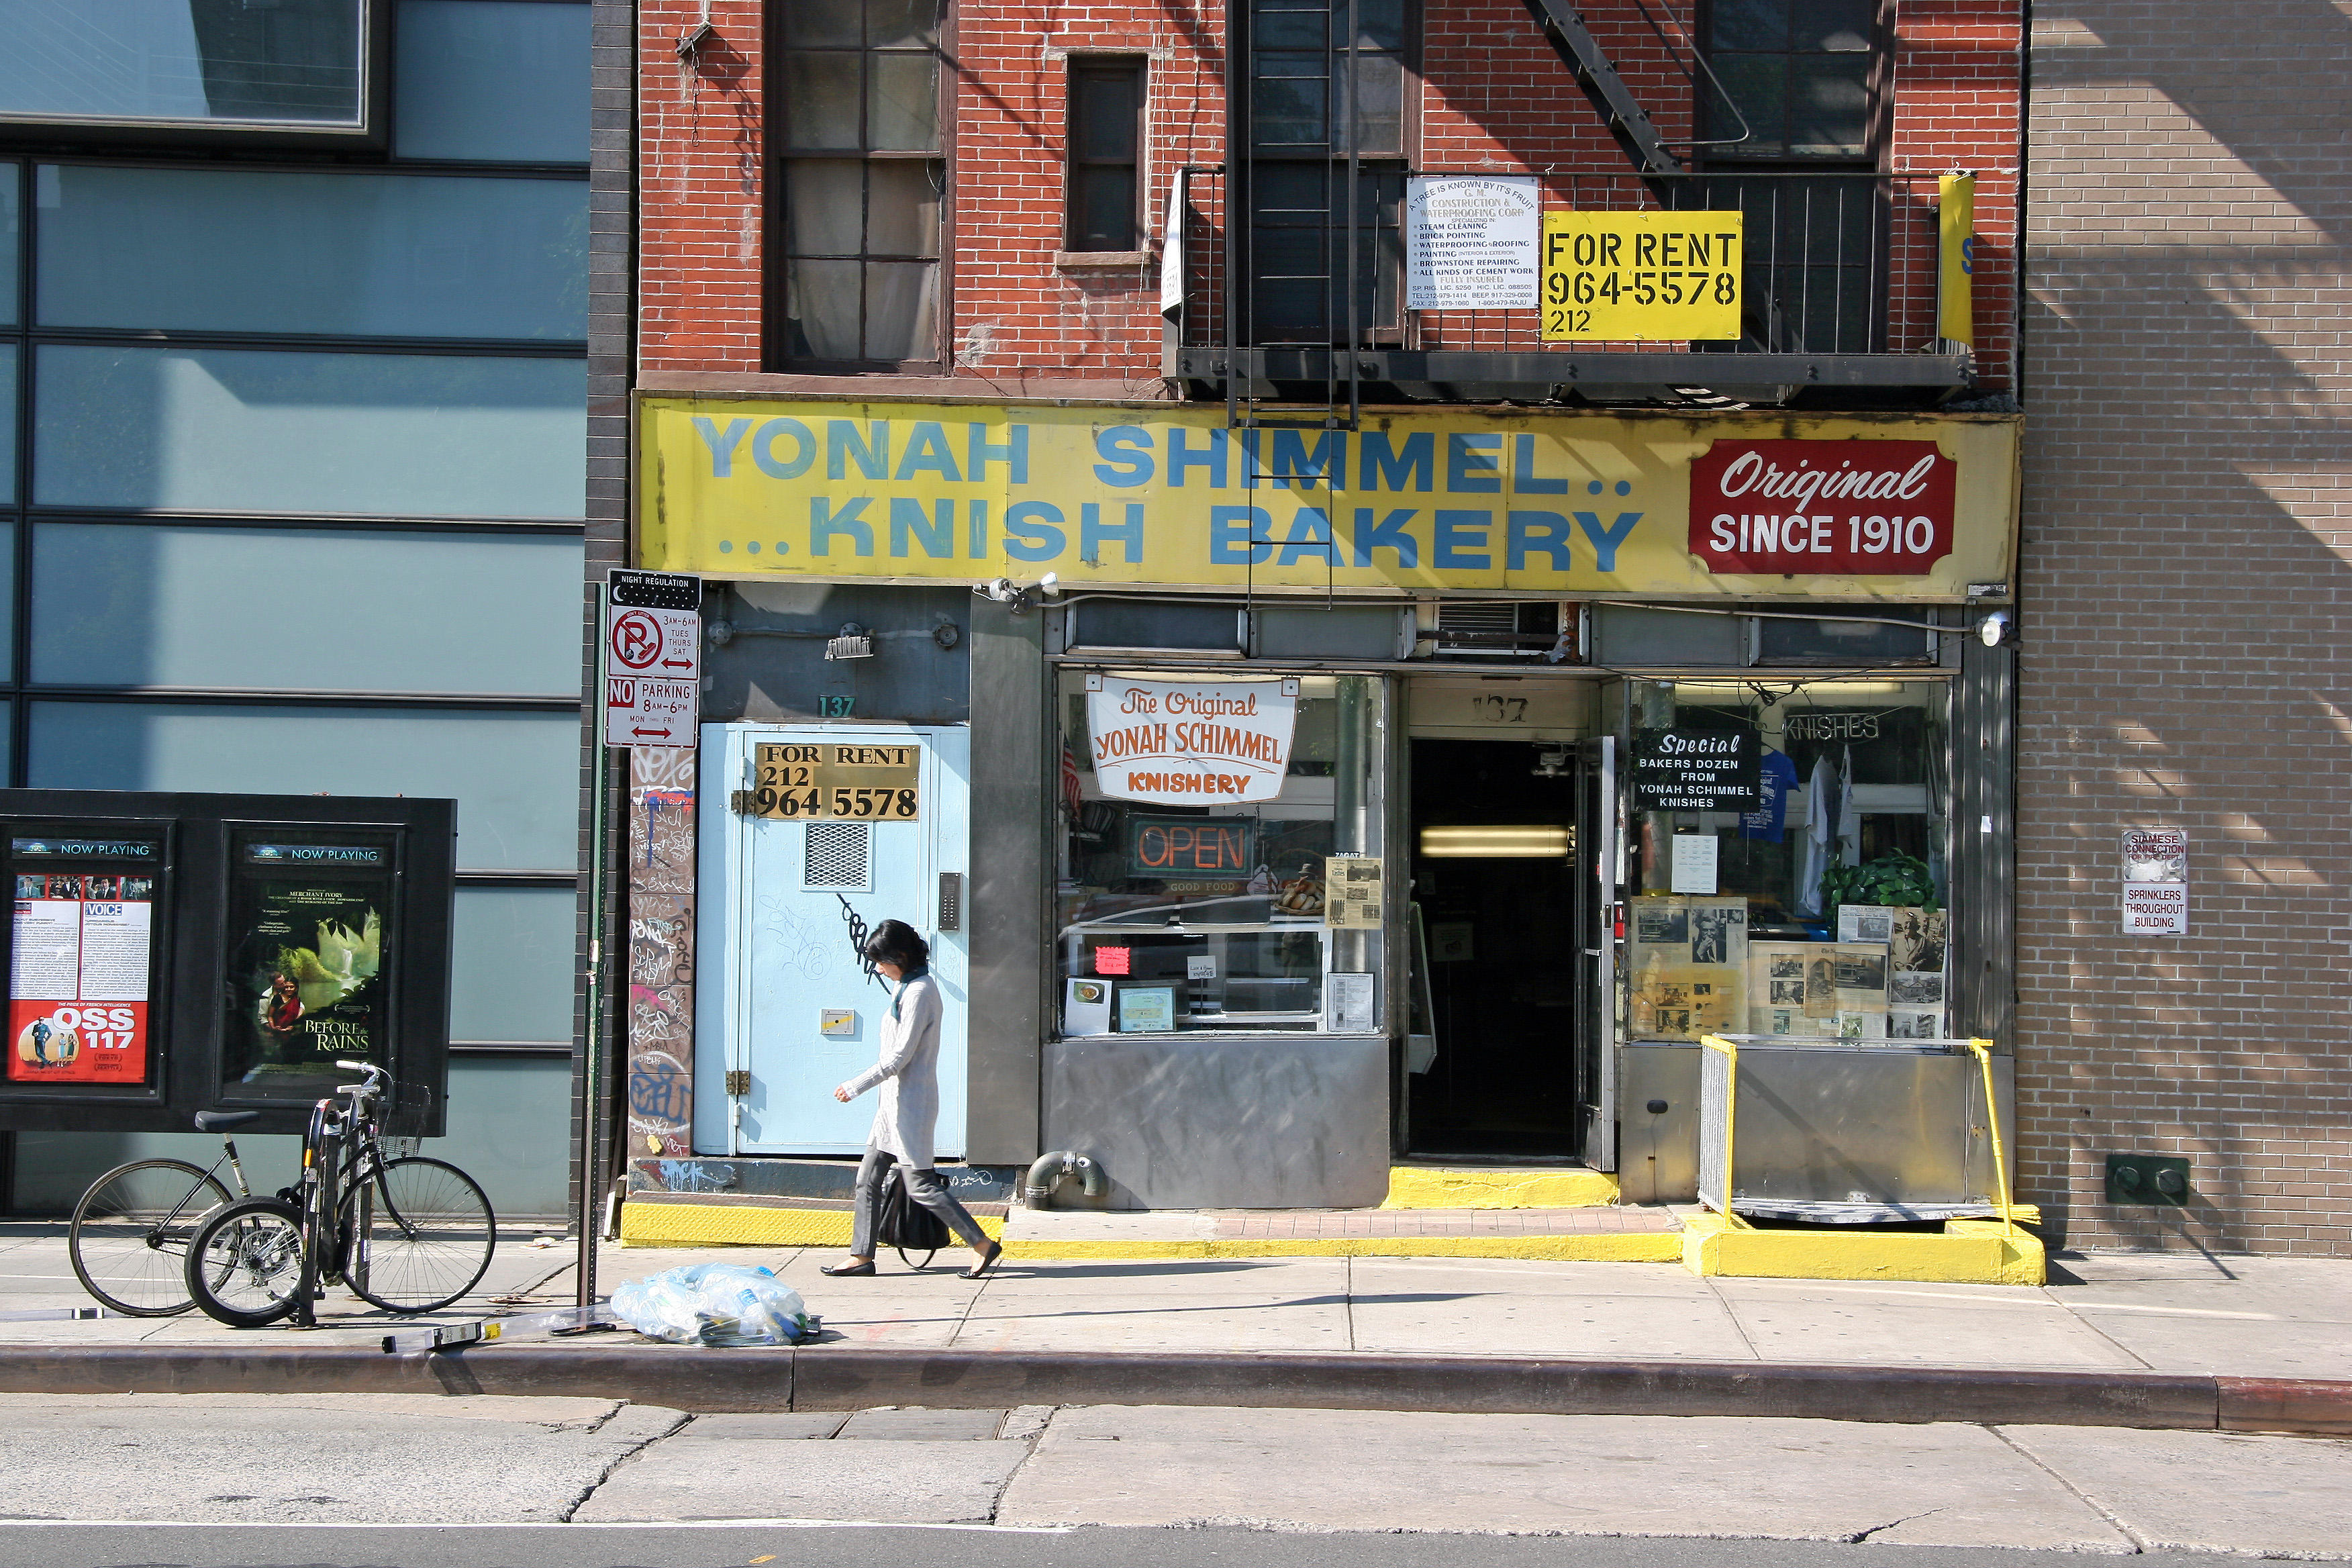 Yonal Shimmel Knish Bakery